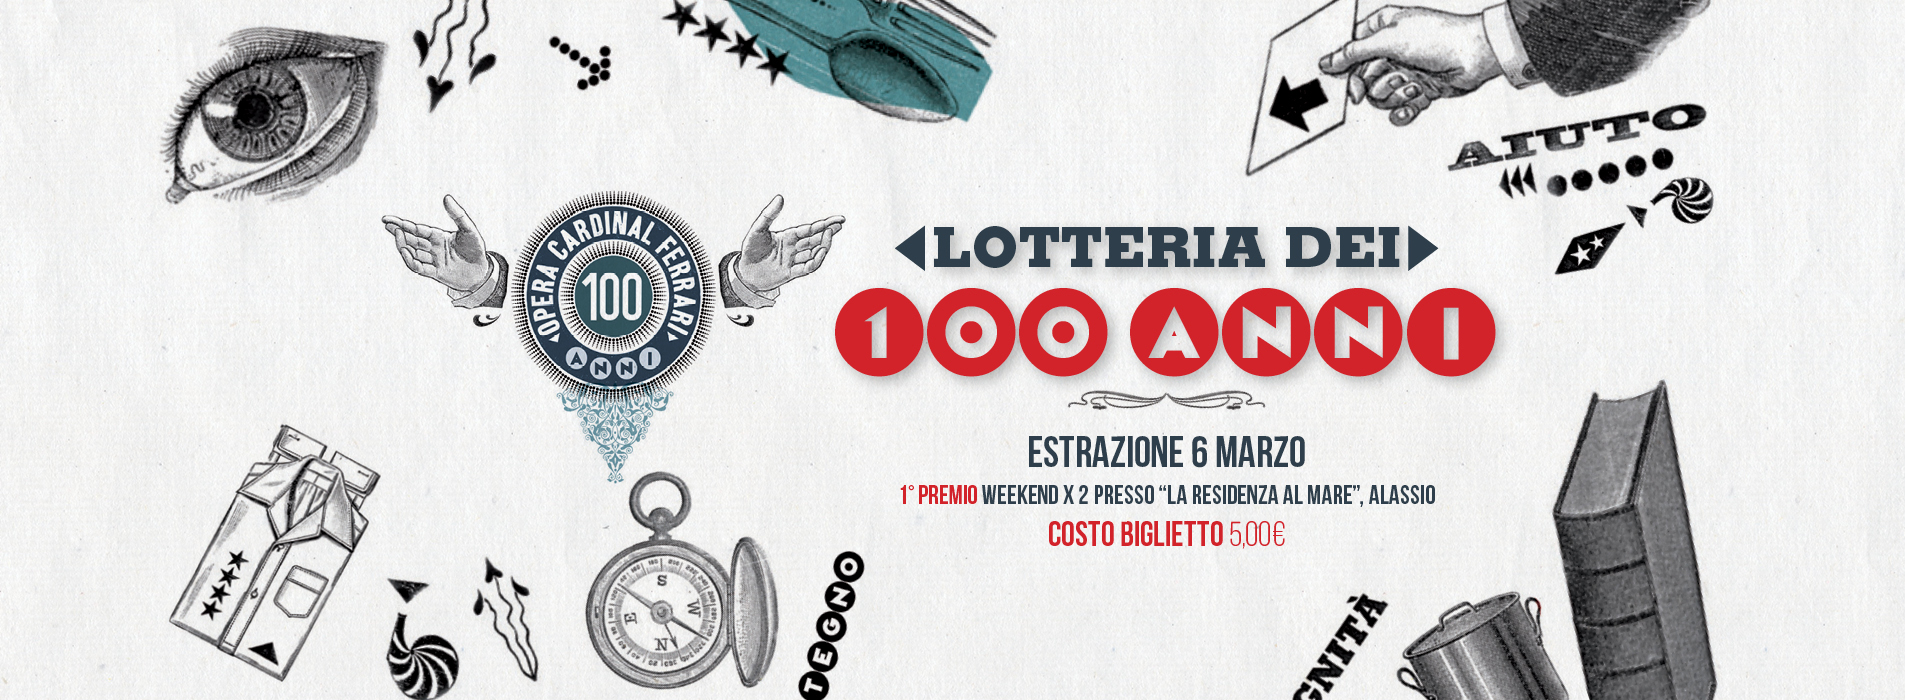 1905x700_lotteria_centenario